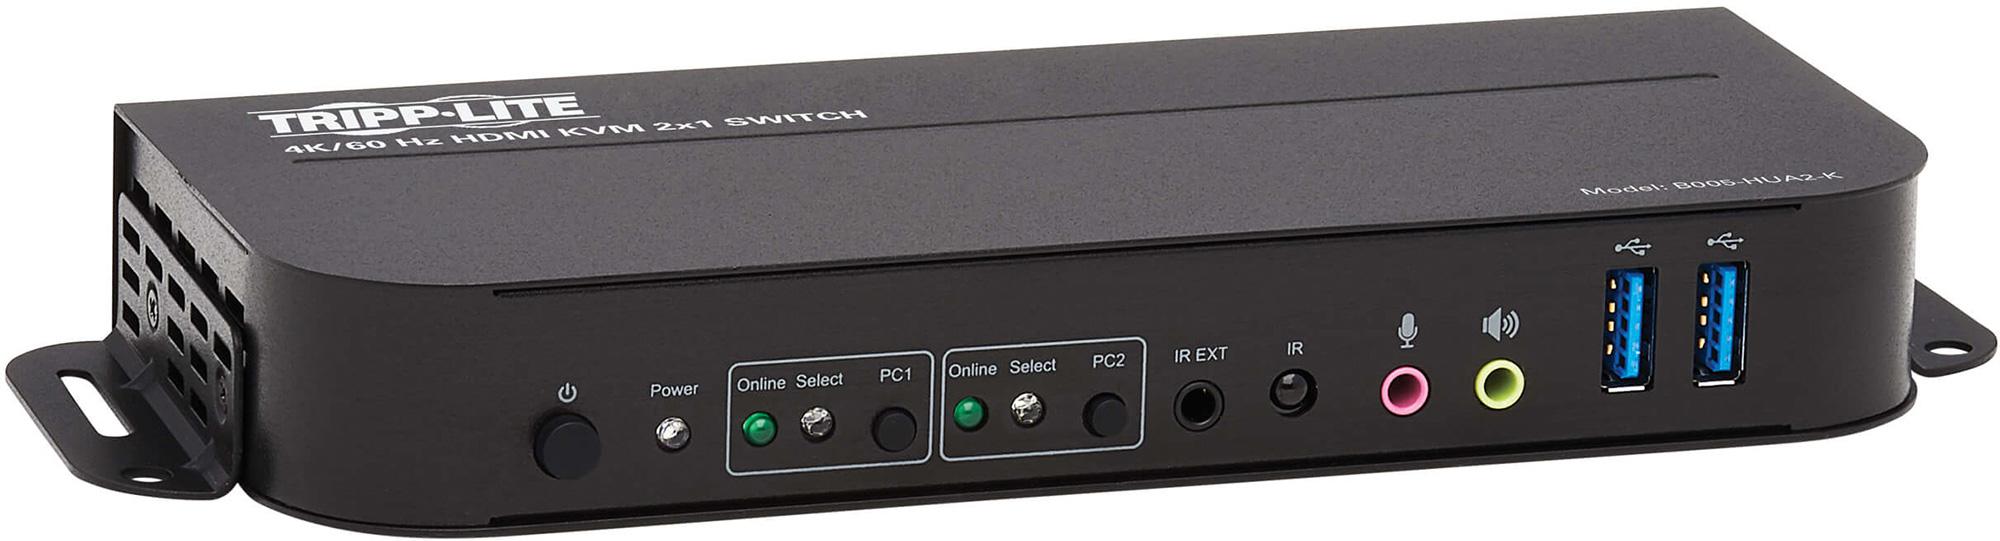 Tripp Lite B005-HUA2-K HDMI USB KVM Switch 2-Port 4K 60Hz HDR HDCP 2.2 IR USB Cables  B005-HUA2-K